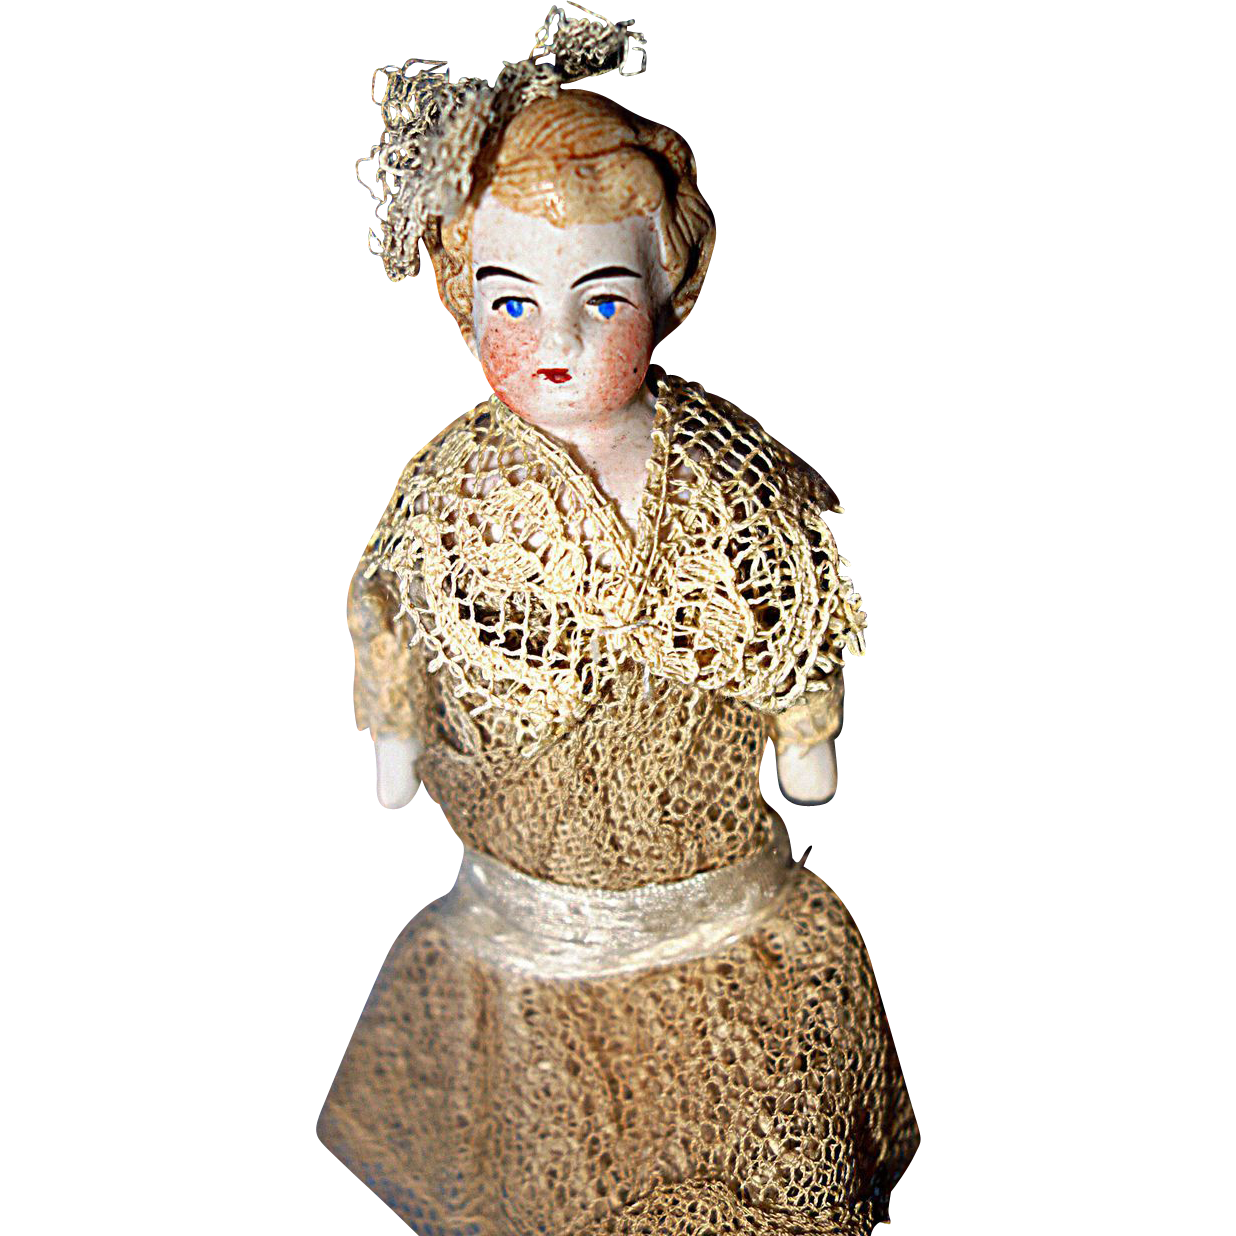 Doll House Little Girl Doll